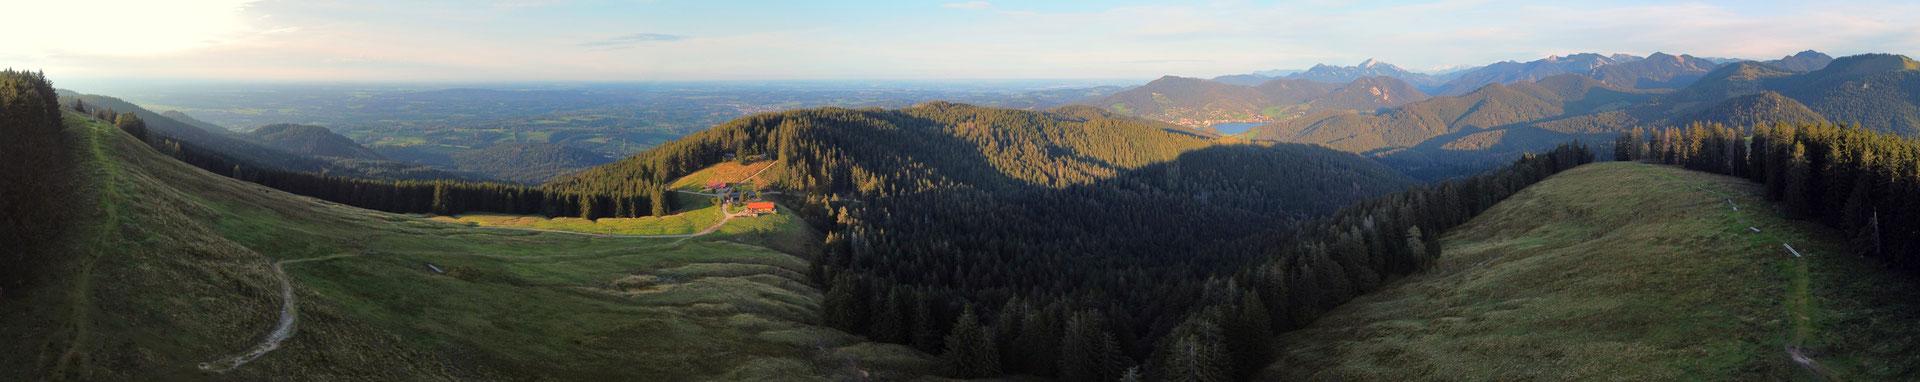 Panorama, Drohnenfoto, Kreuzberg, Gindelalm, Gindelalmschneid, Tegernsee, Wald, Berge, Alpen